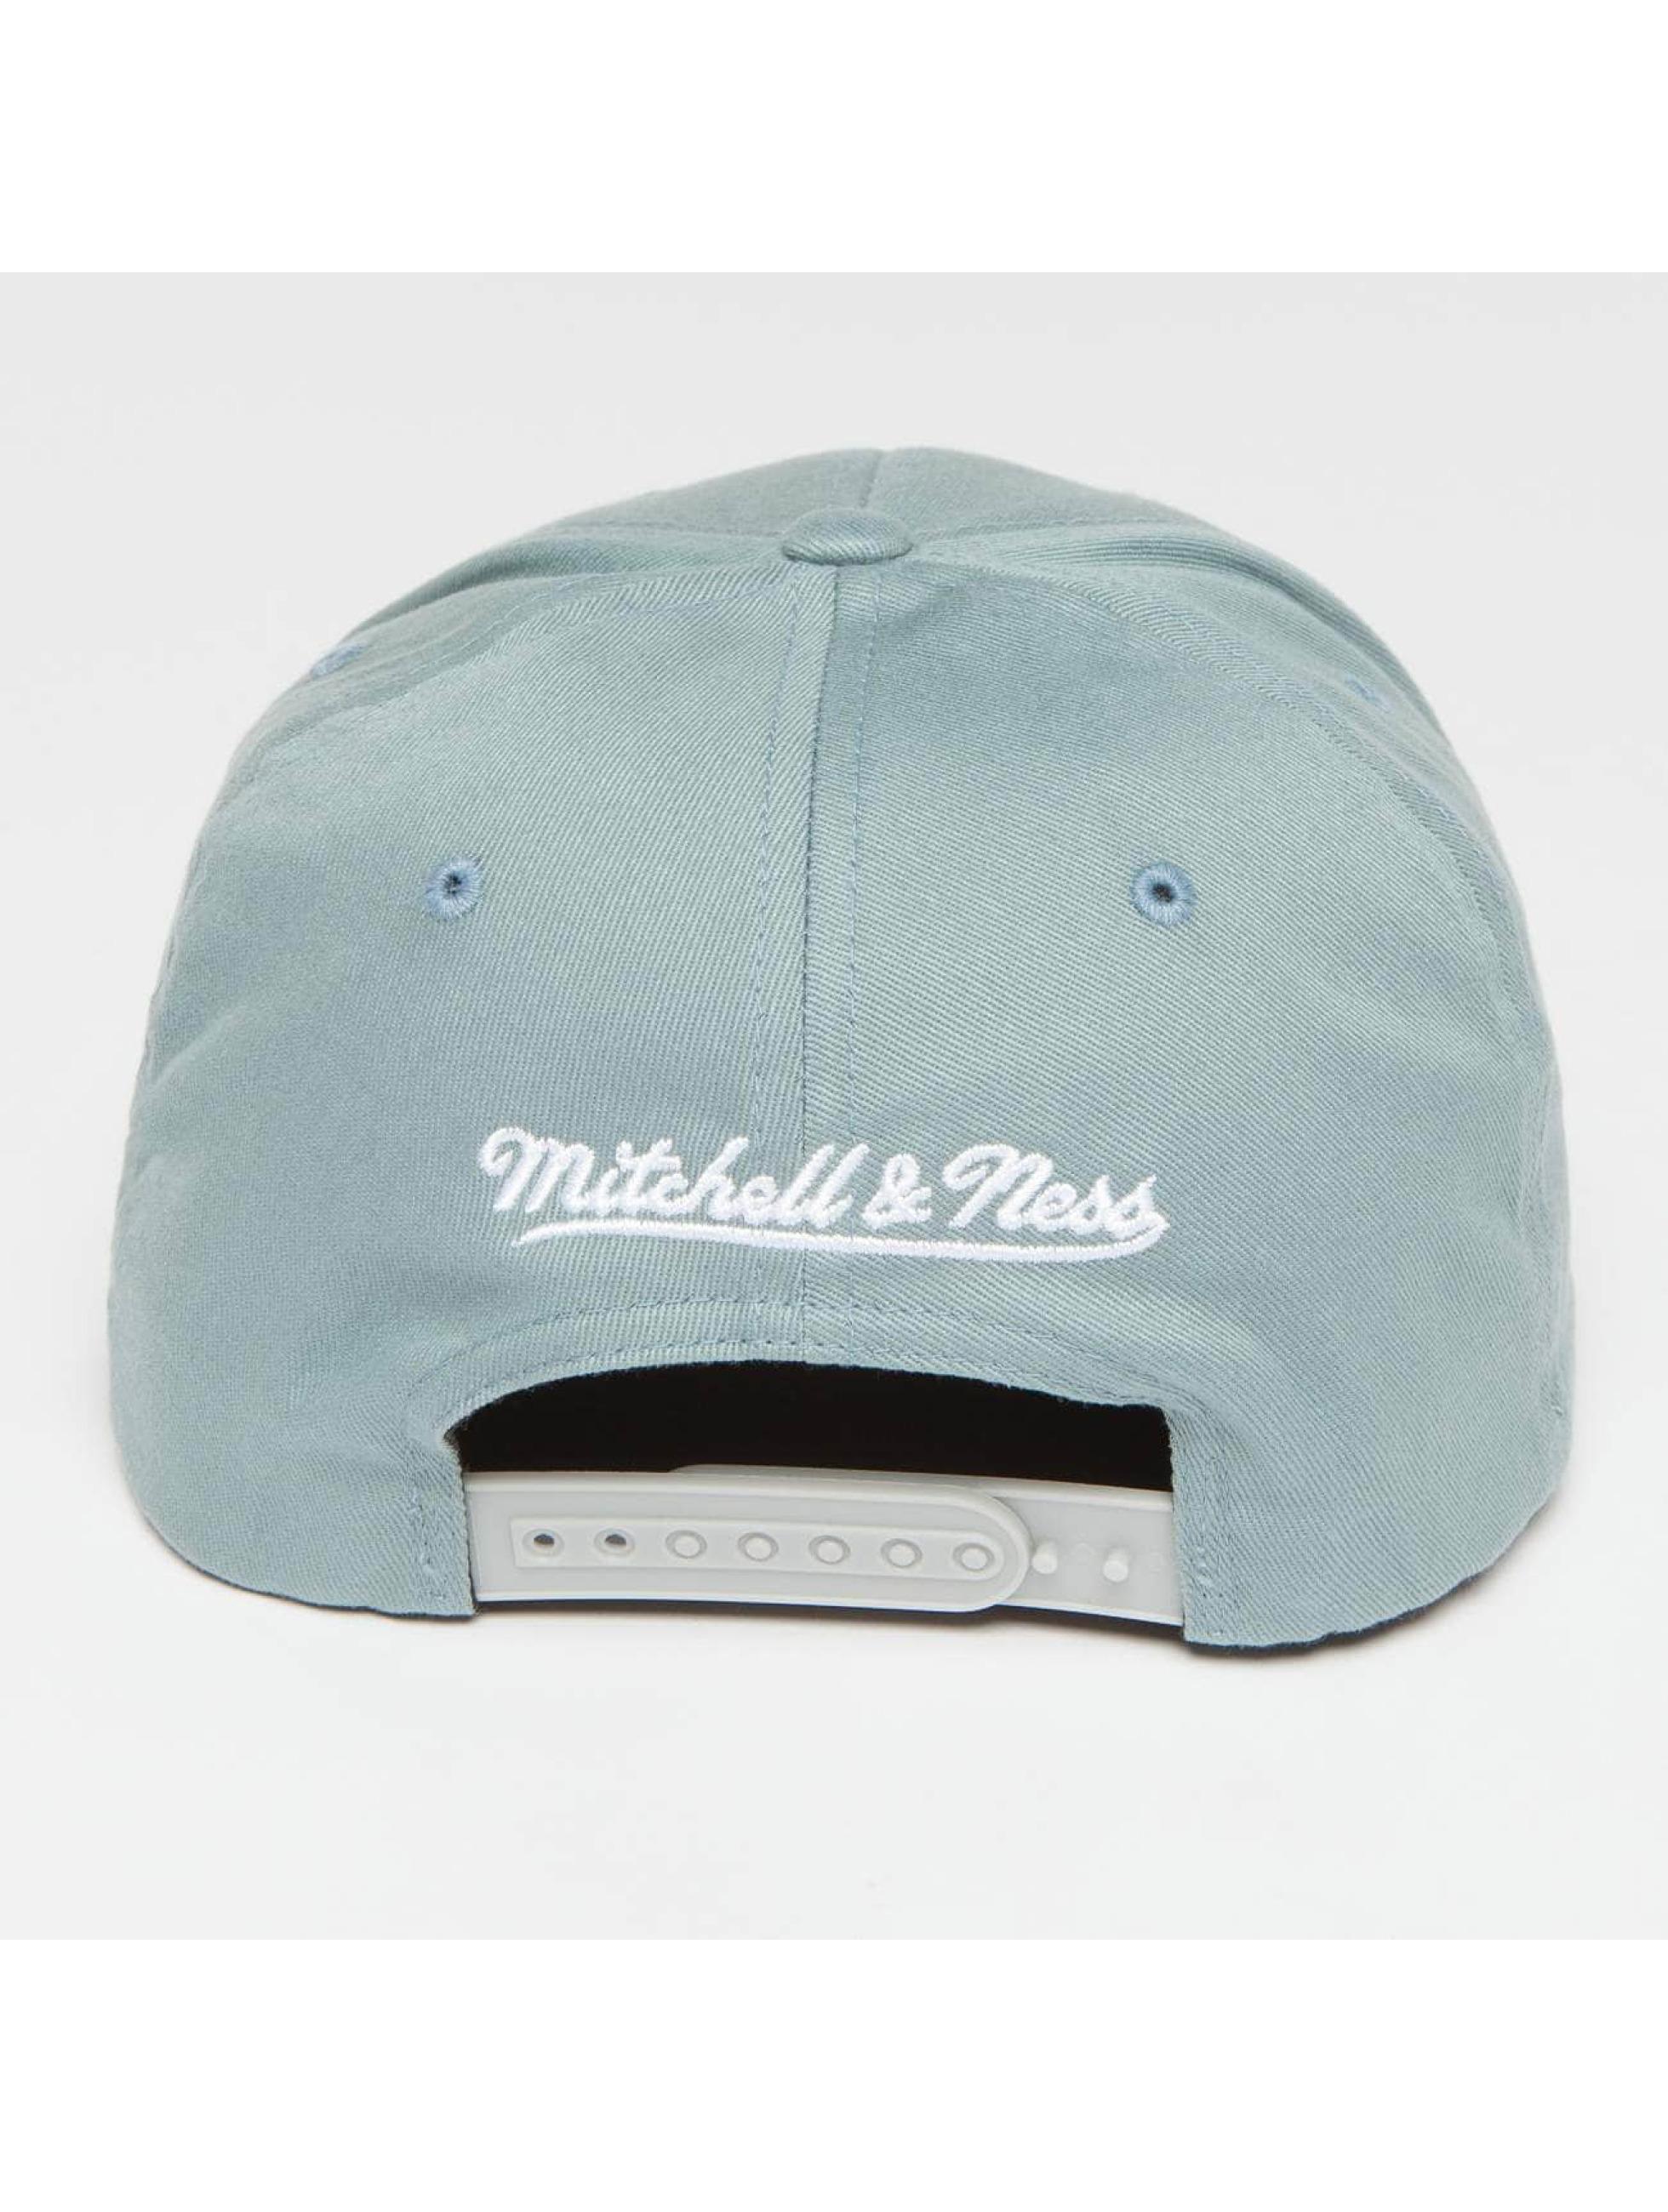 Mitchell & Ness Snapback Cap Own Brand Pinscript High Crown 110 blue